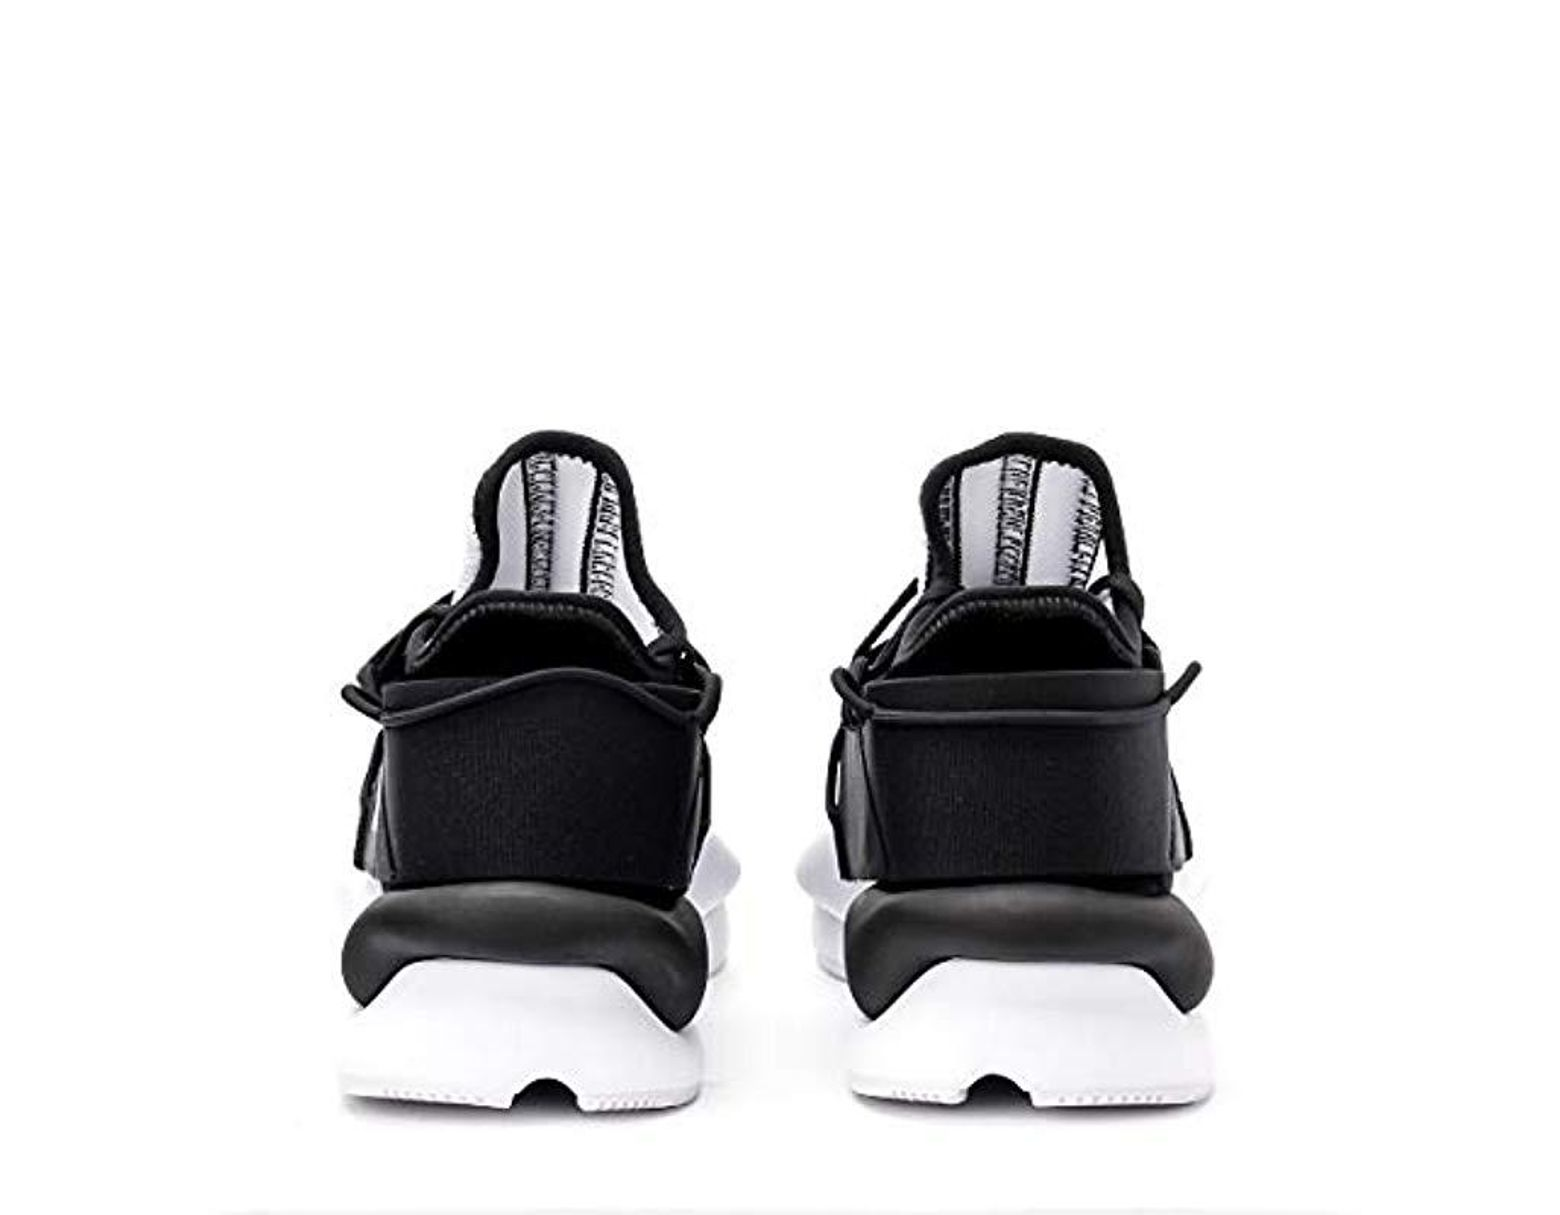 fdc69ab4285 adidas Y-3-sneakers Y-3 Kaiwa Knit F97424 in Black for Men - Lyst